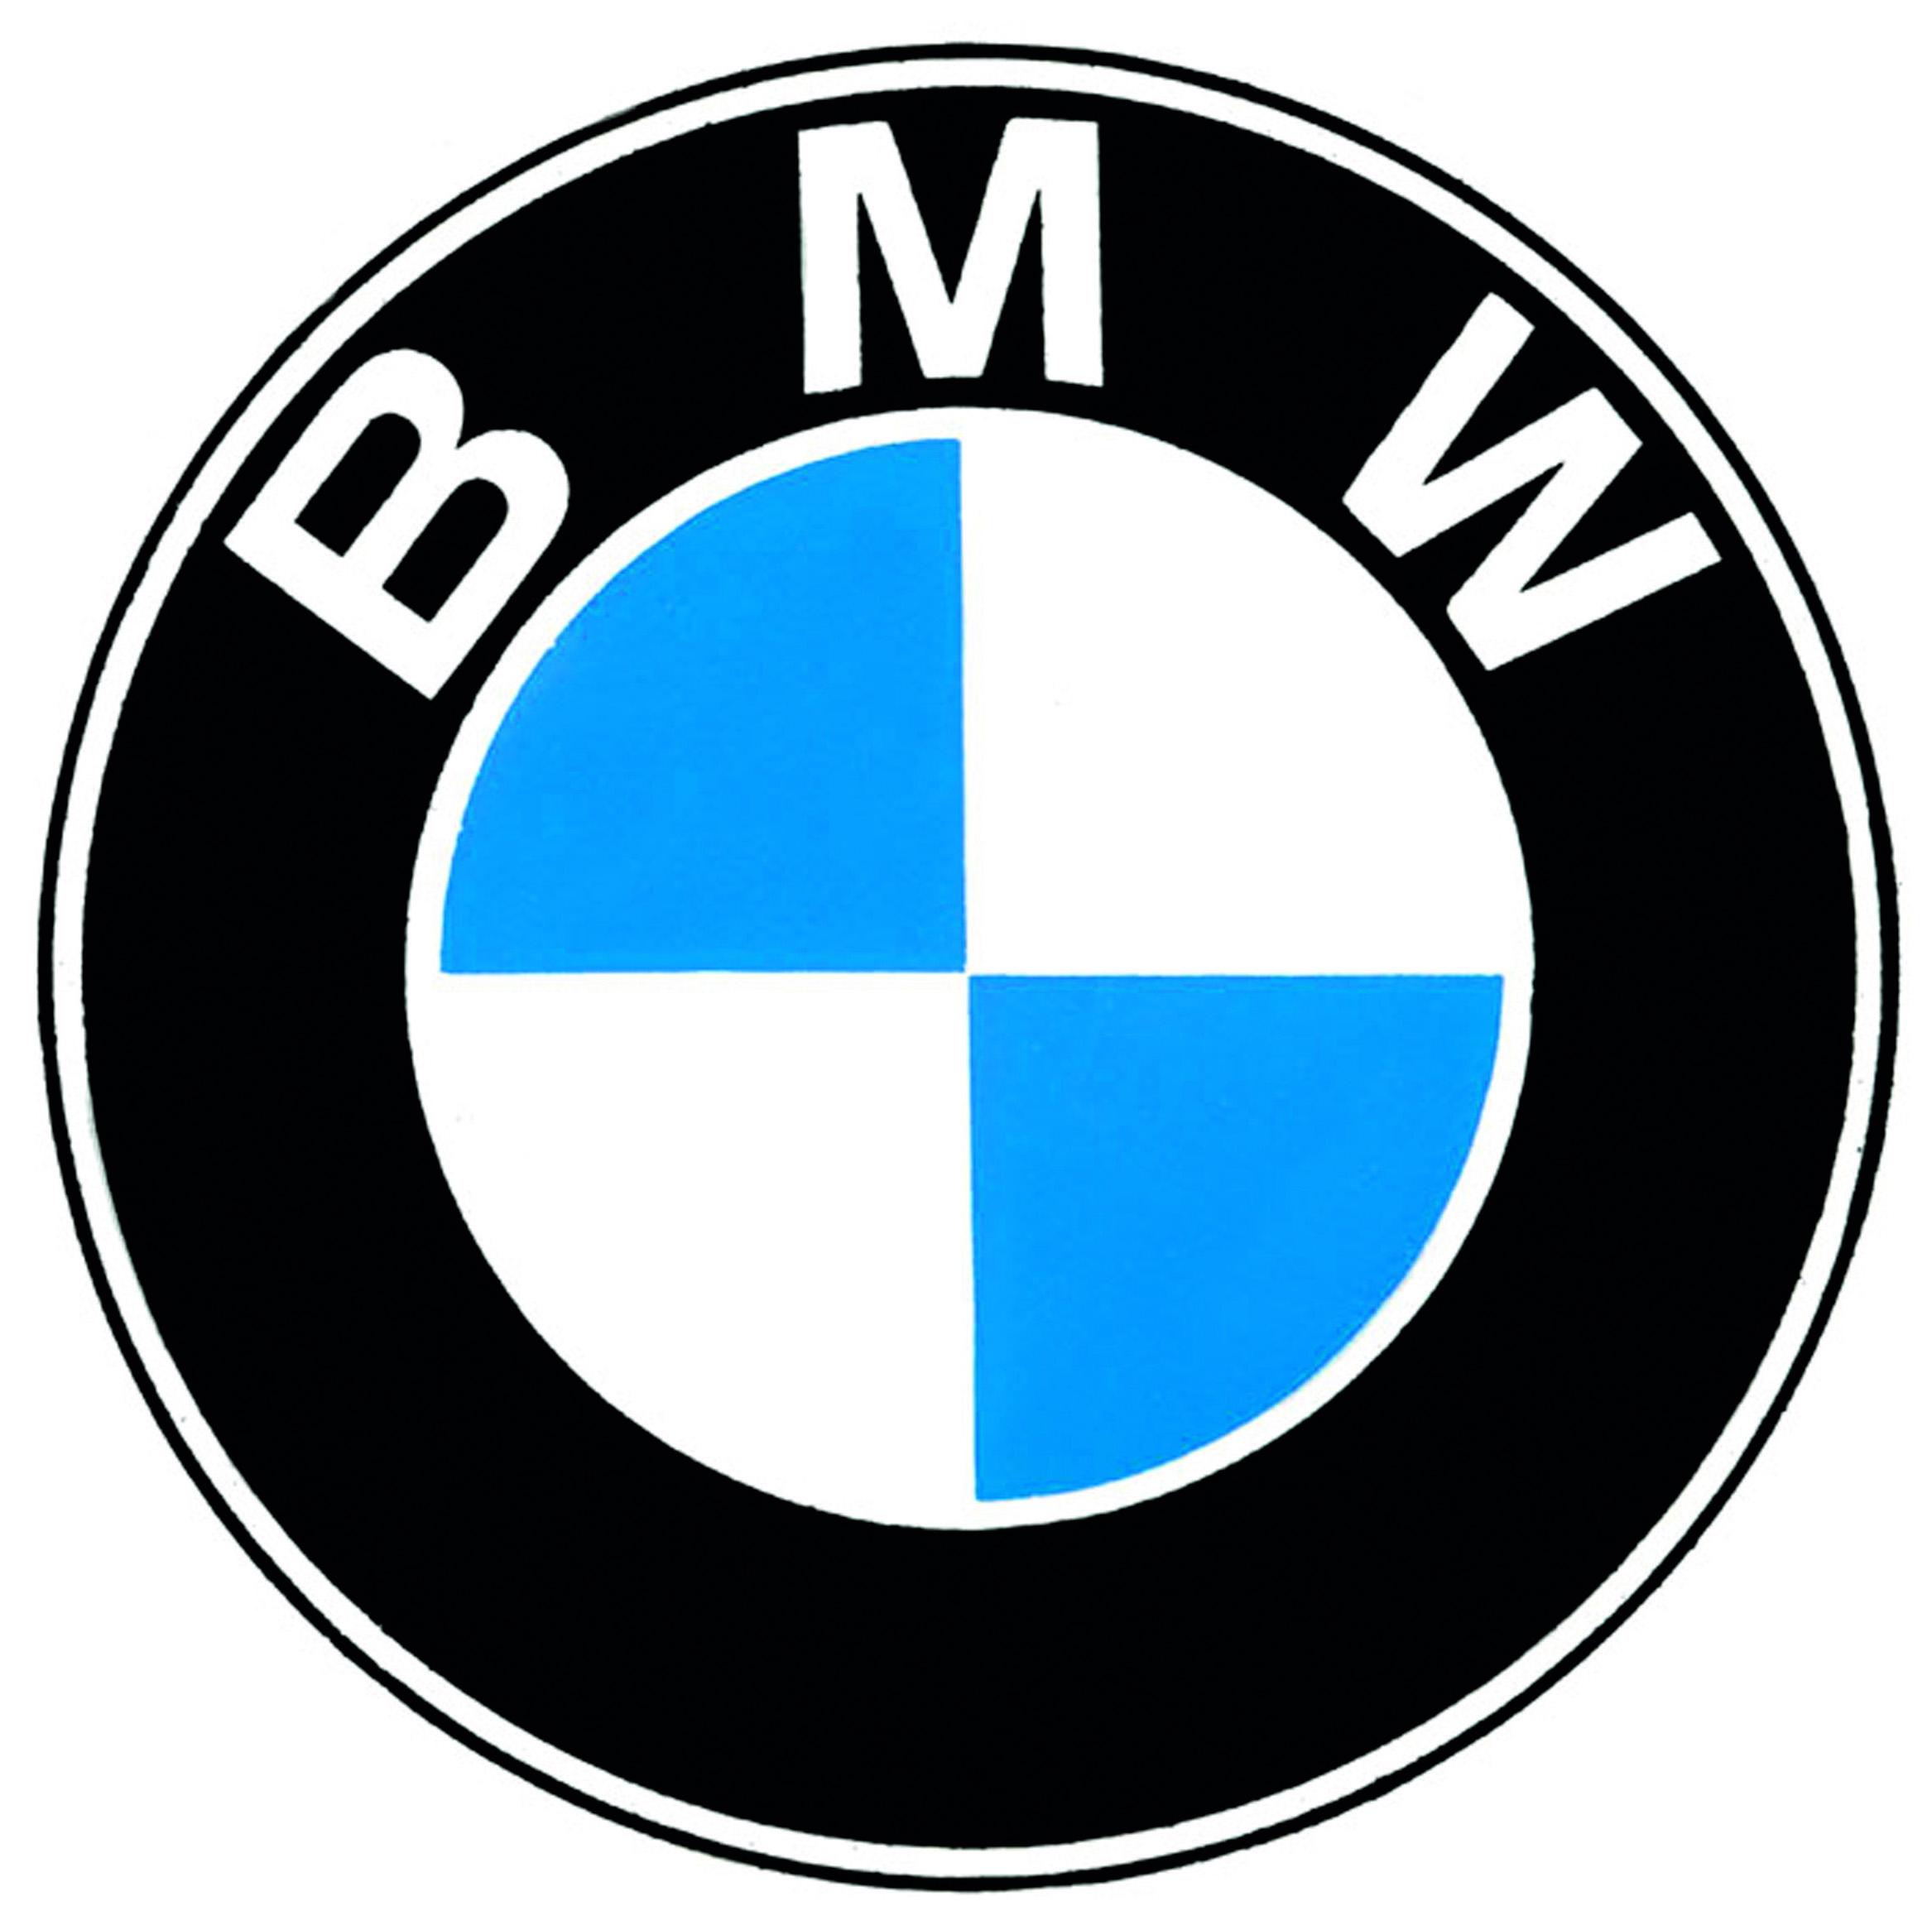 Bmw_logo-2.jpg